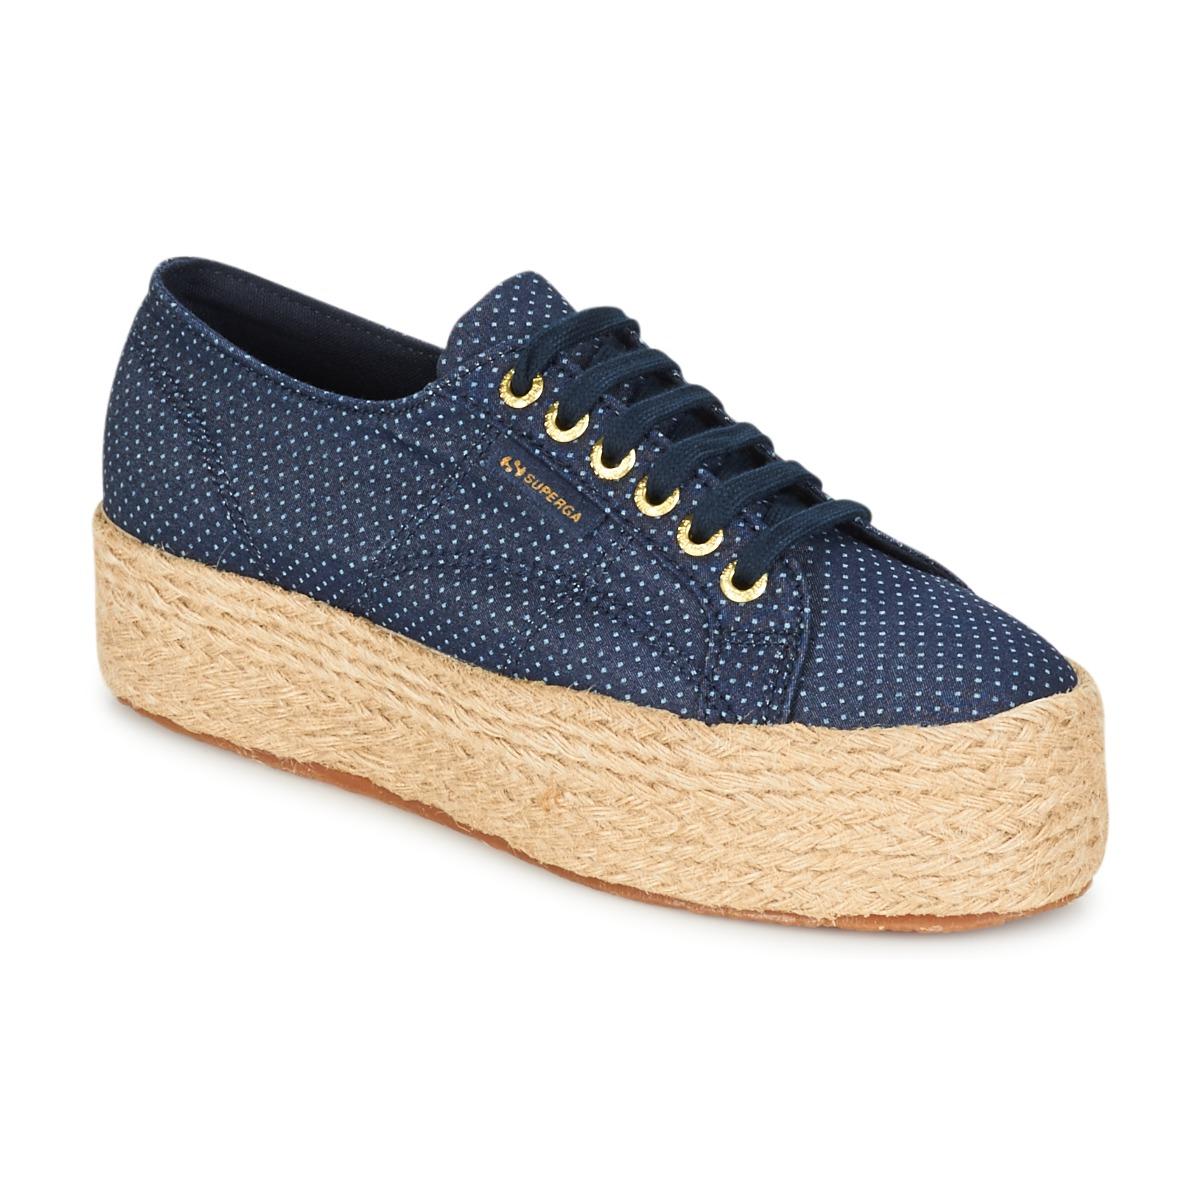 Sneakers Scarpe donna Superga  2790 FABRIC SHIRT TROPEW  Blu